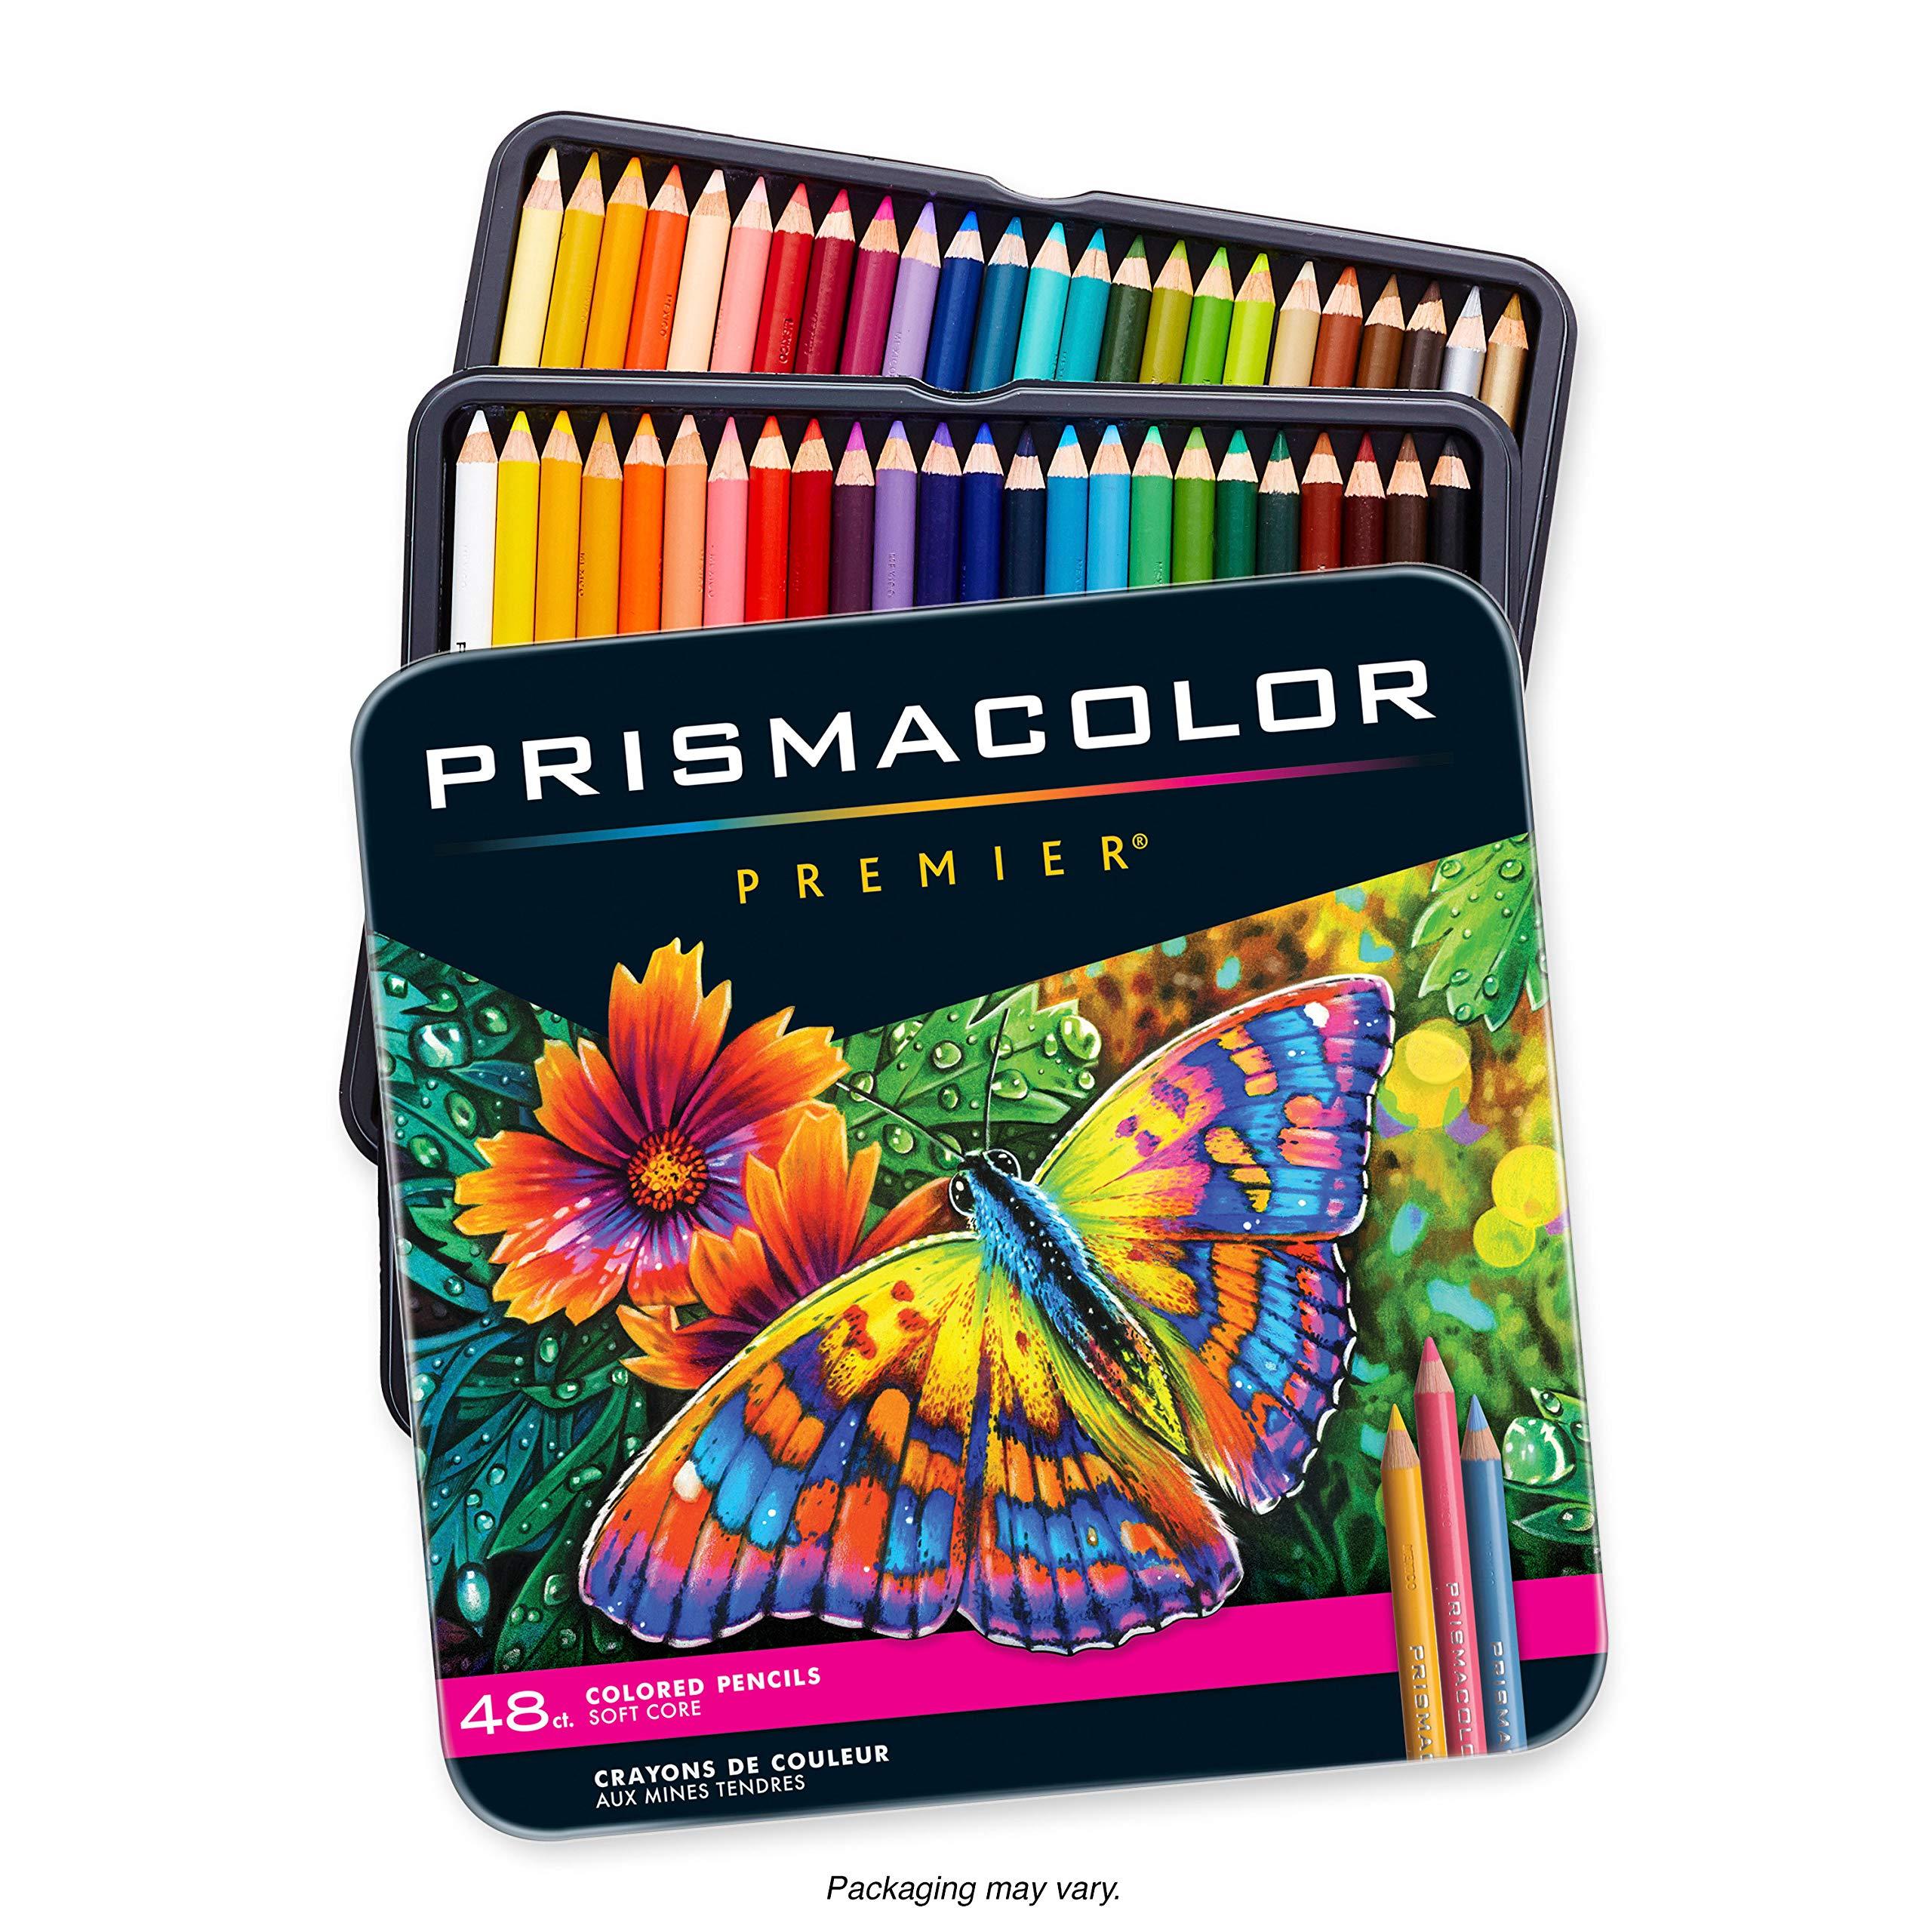 Prismacolor Premier Colored Pencils | Art Supplies for Drawing, Sketching, Adult Coloring | Soft Core Color Pencils, 48 Pack